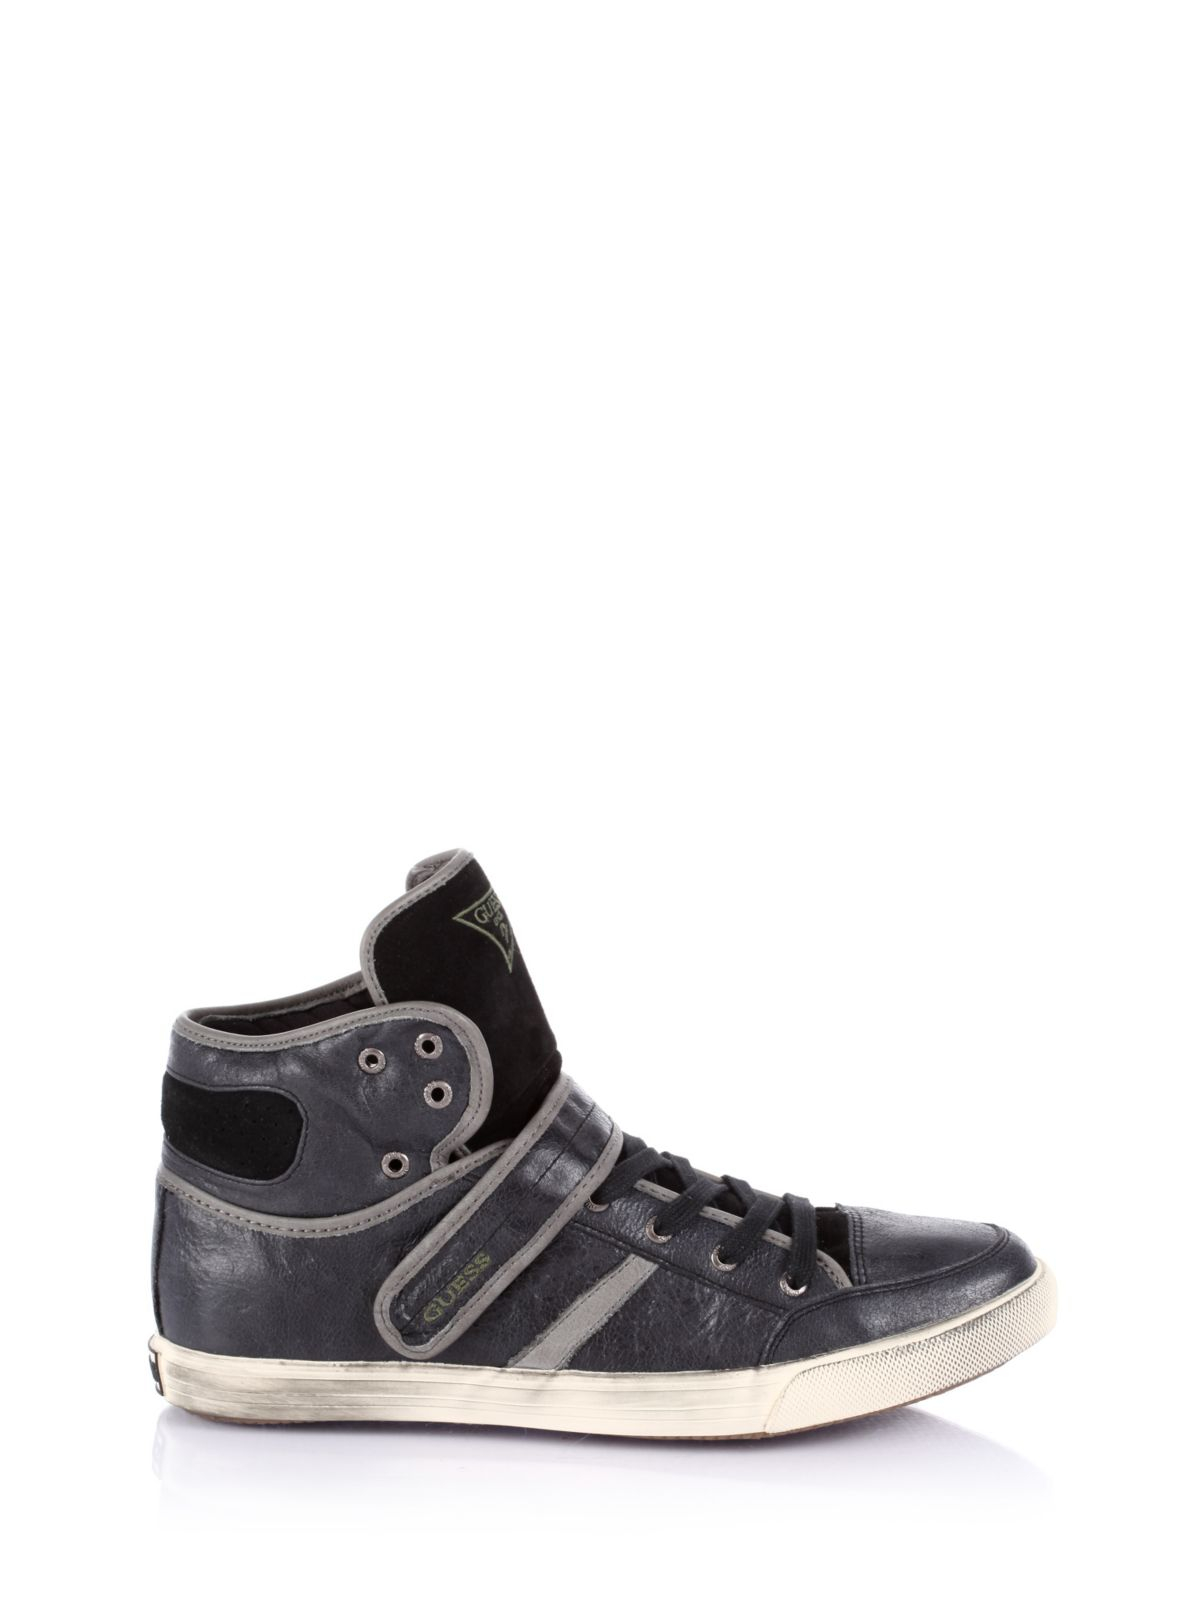 christian louboutin rondo shoes men on sale   Landenberg Christian ...